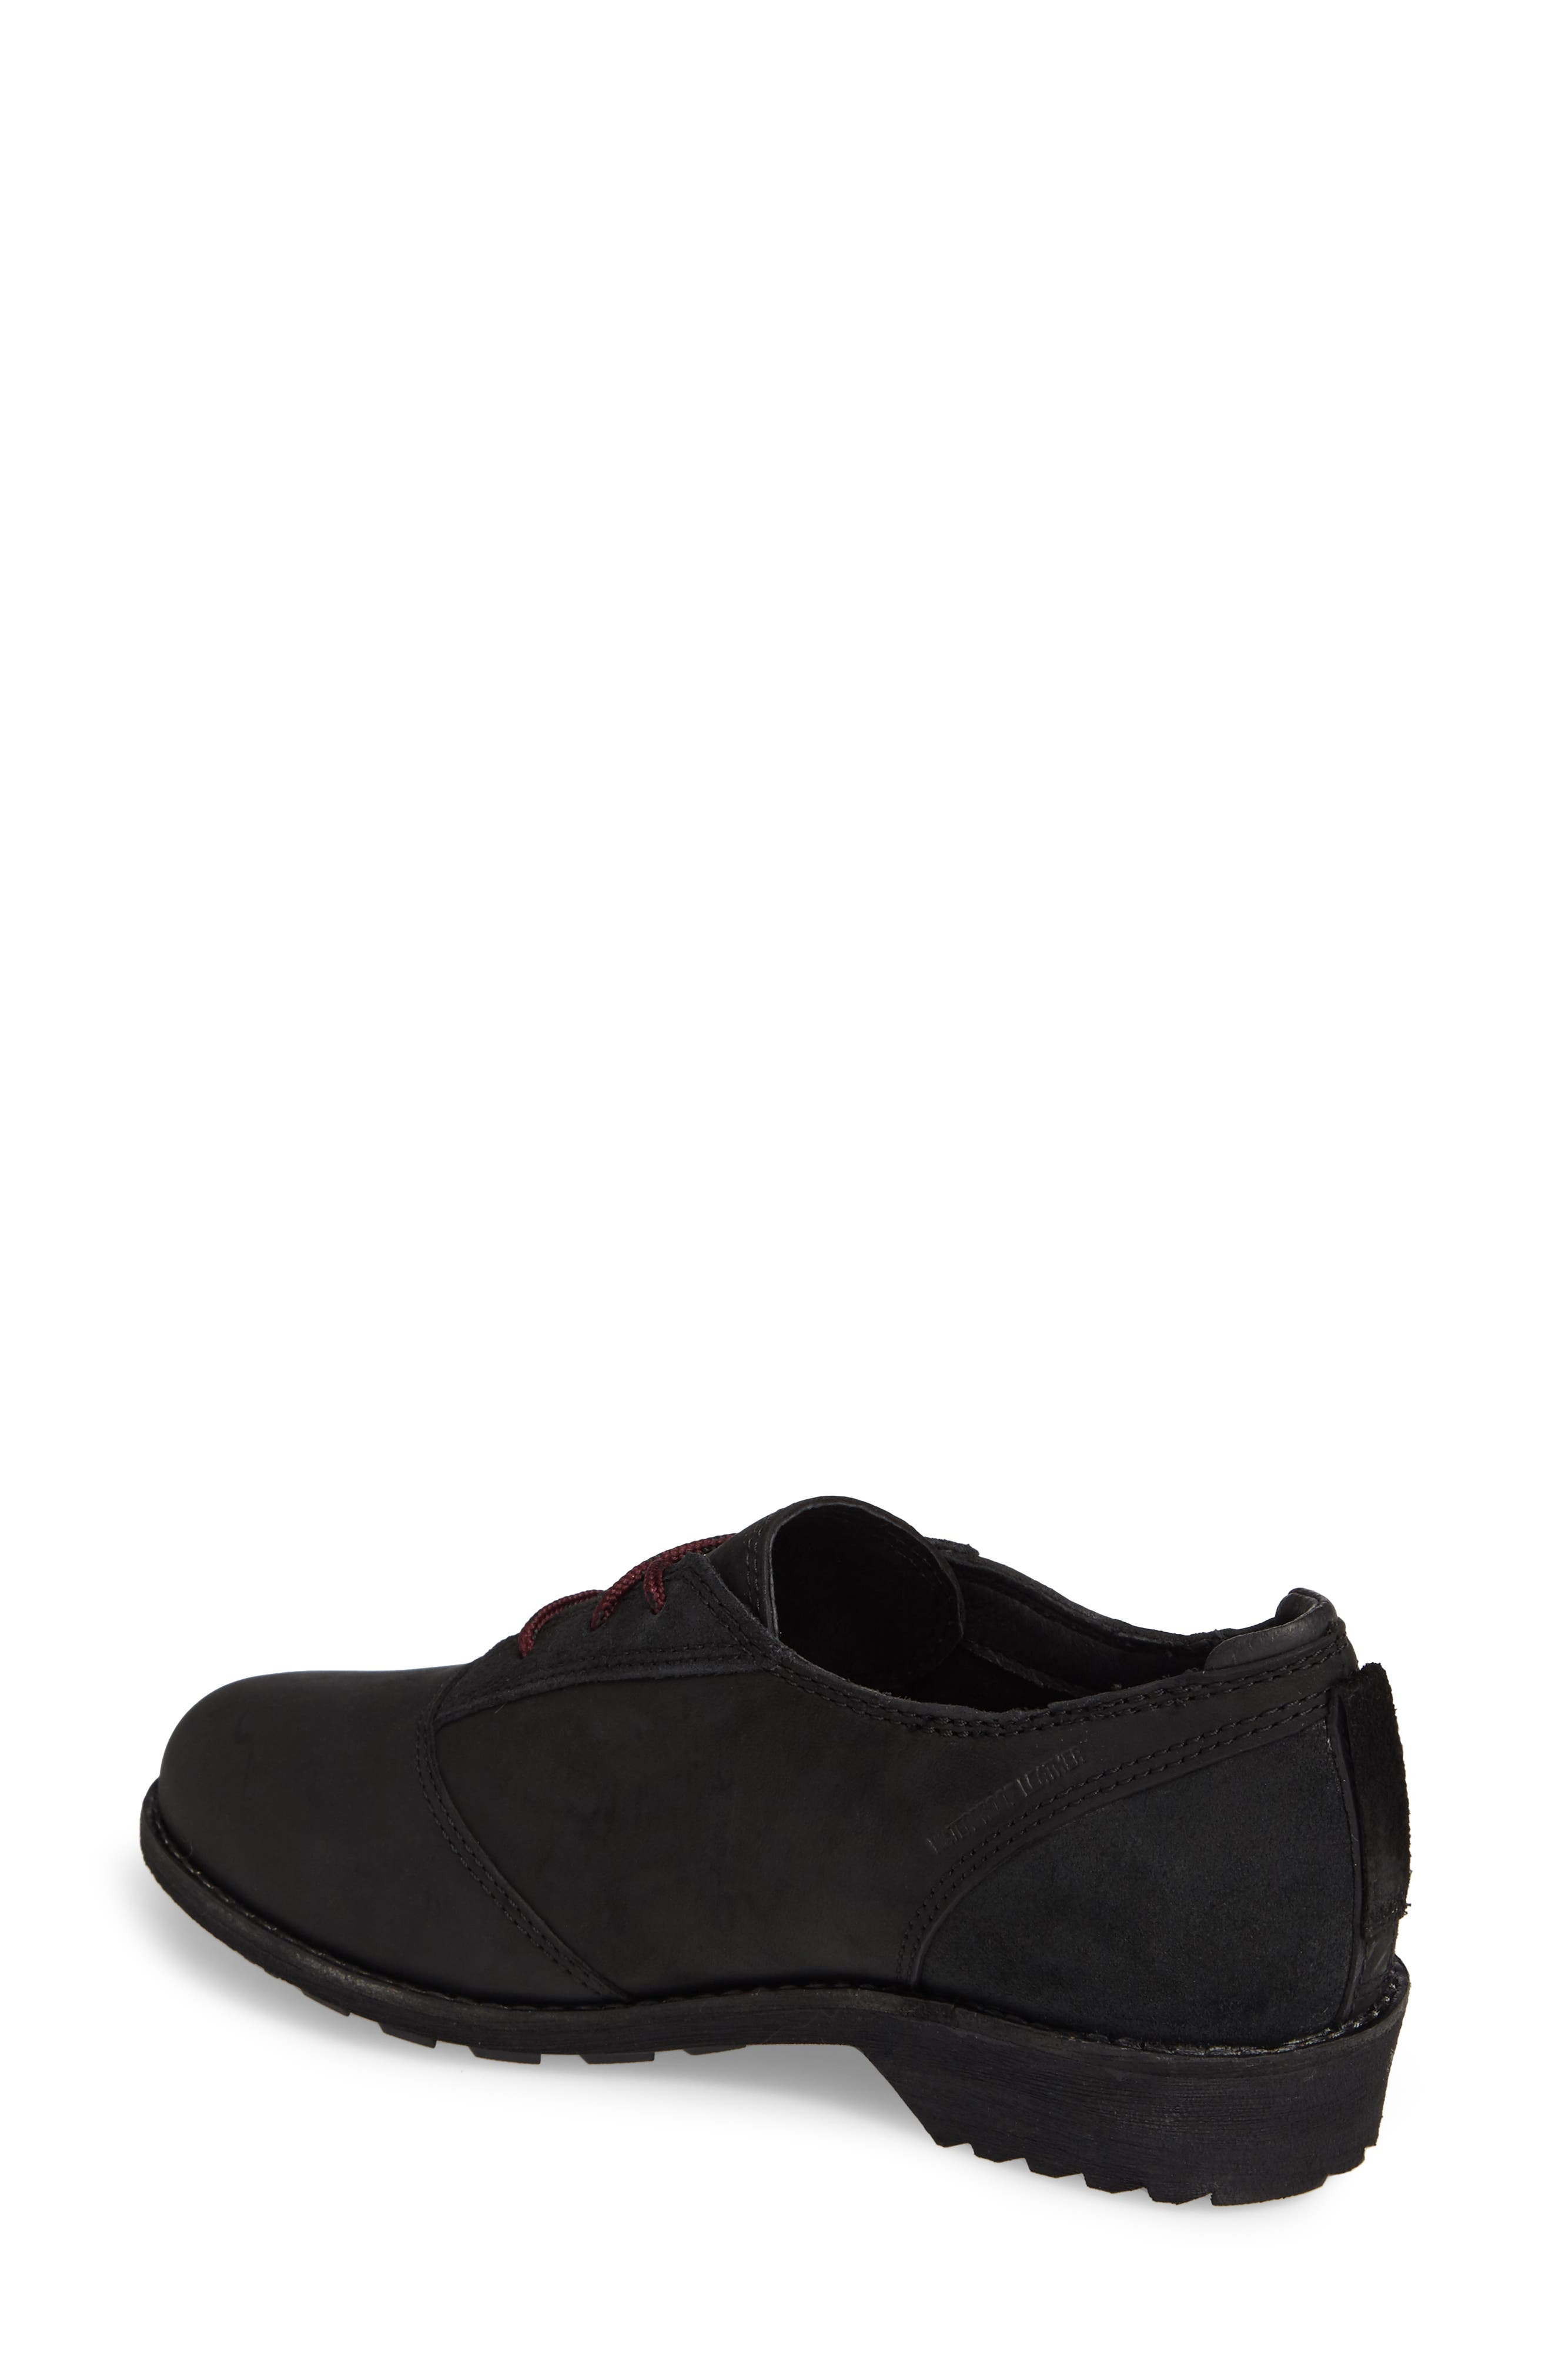 De La Vina Dos Waterproof Sneaker,                             Alternate thumbnail 2, color,                             001